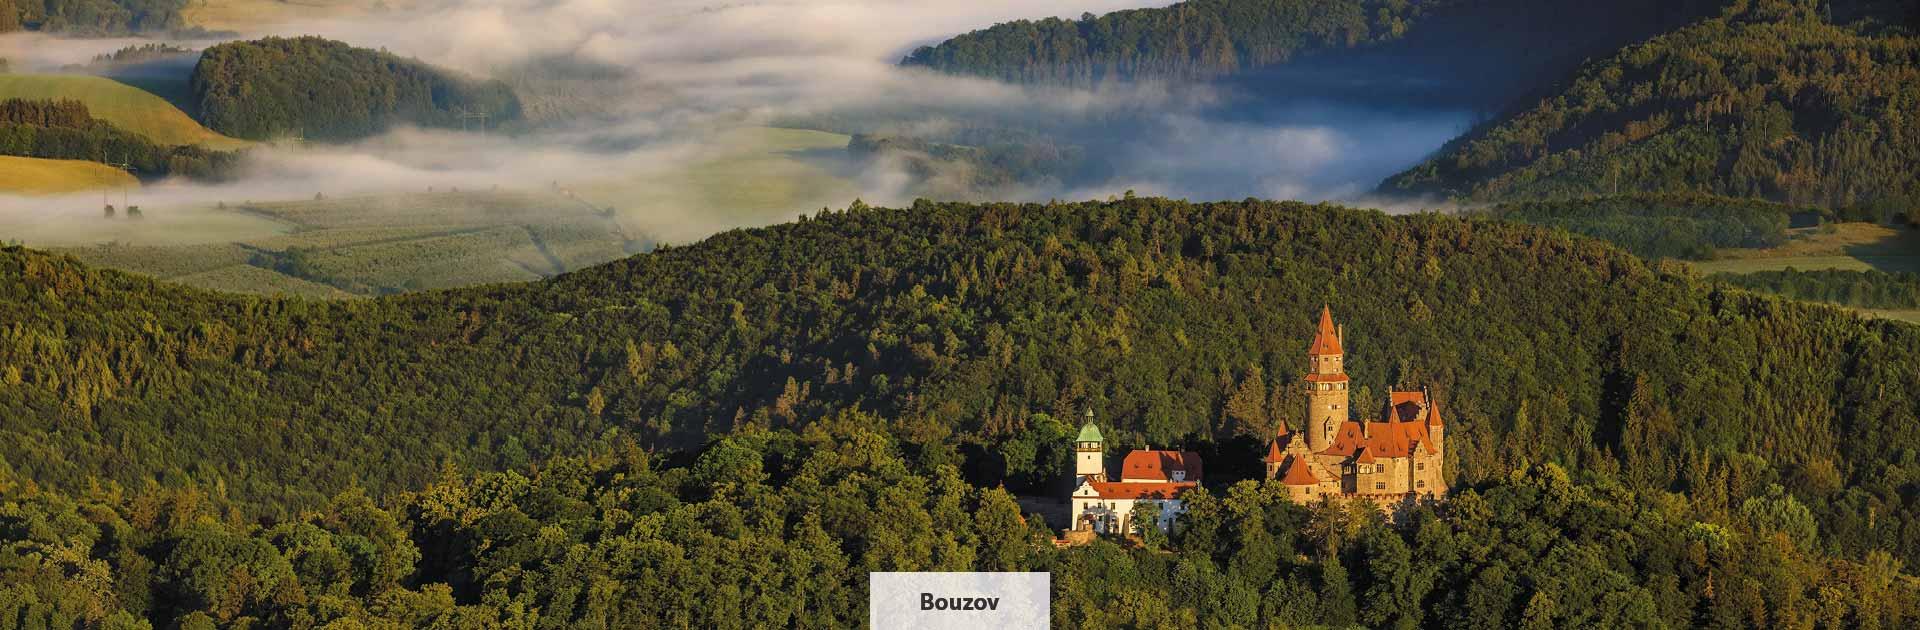 Bouzov - Česká republika UNESCO